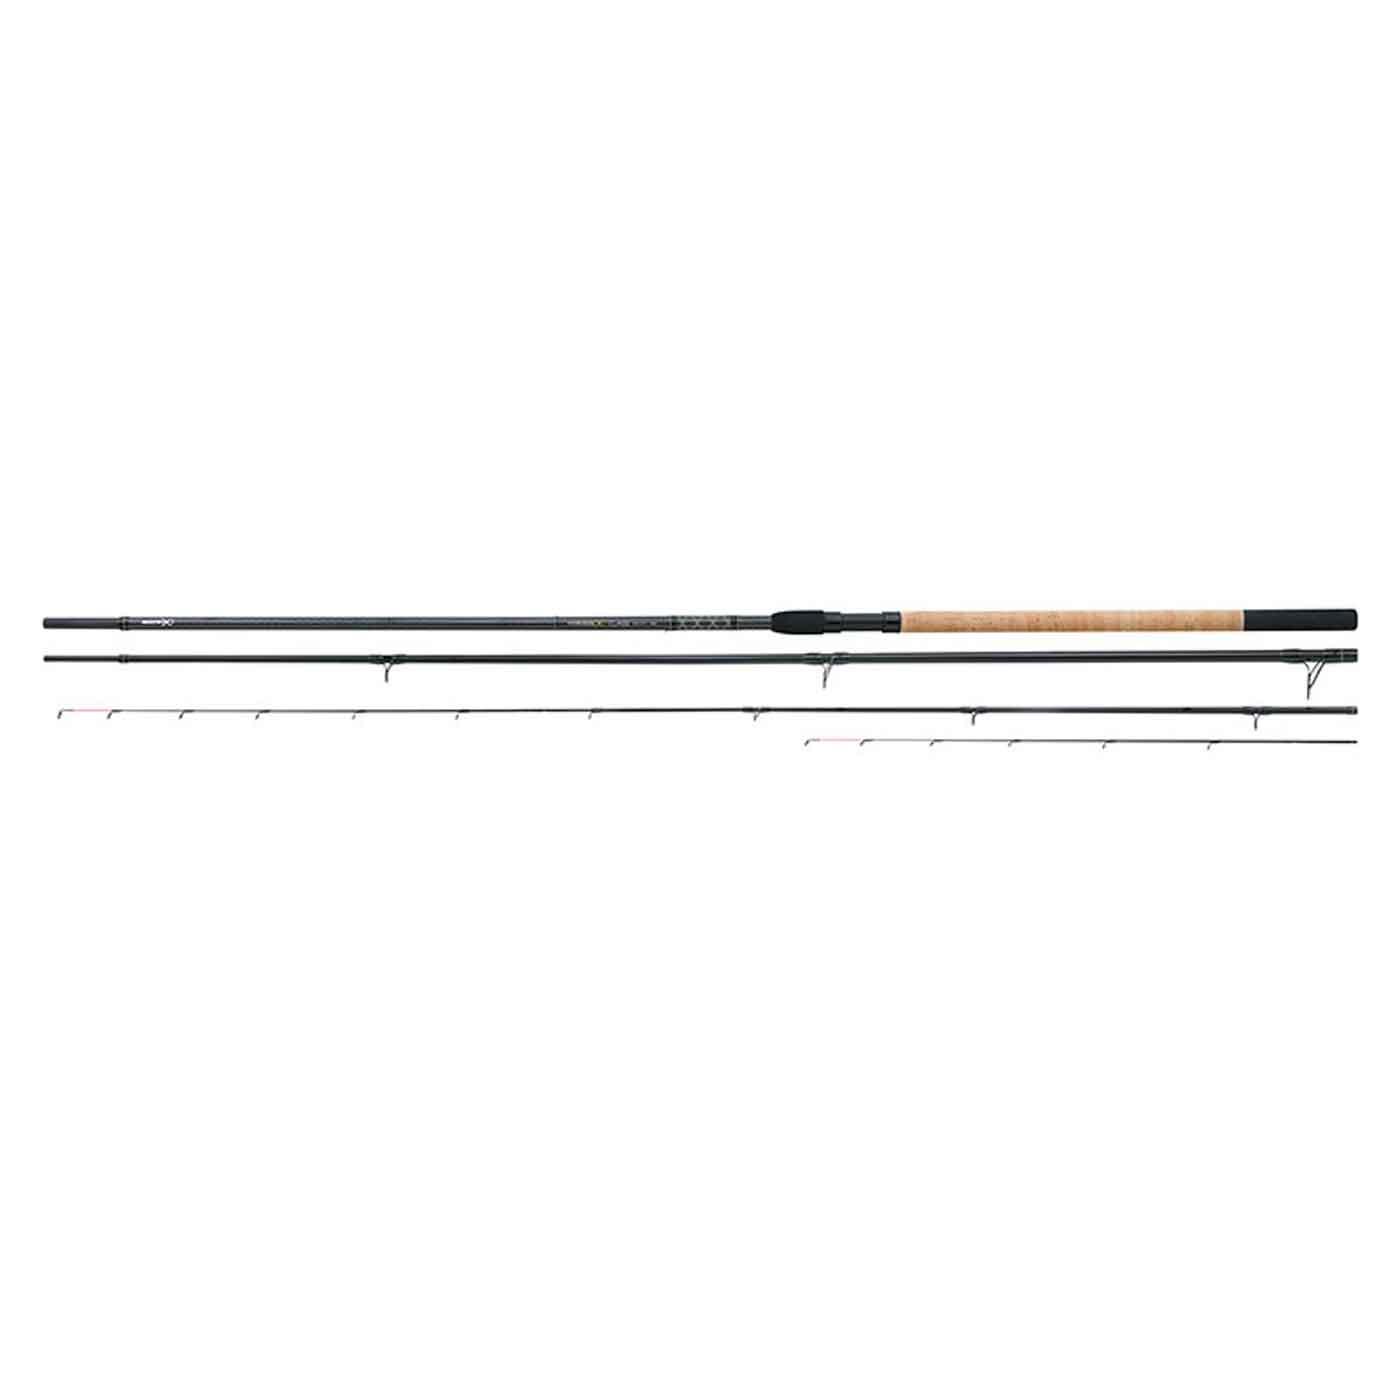 Matrix Horizon XD Class 4.3m 150g 3pc Rod